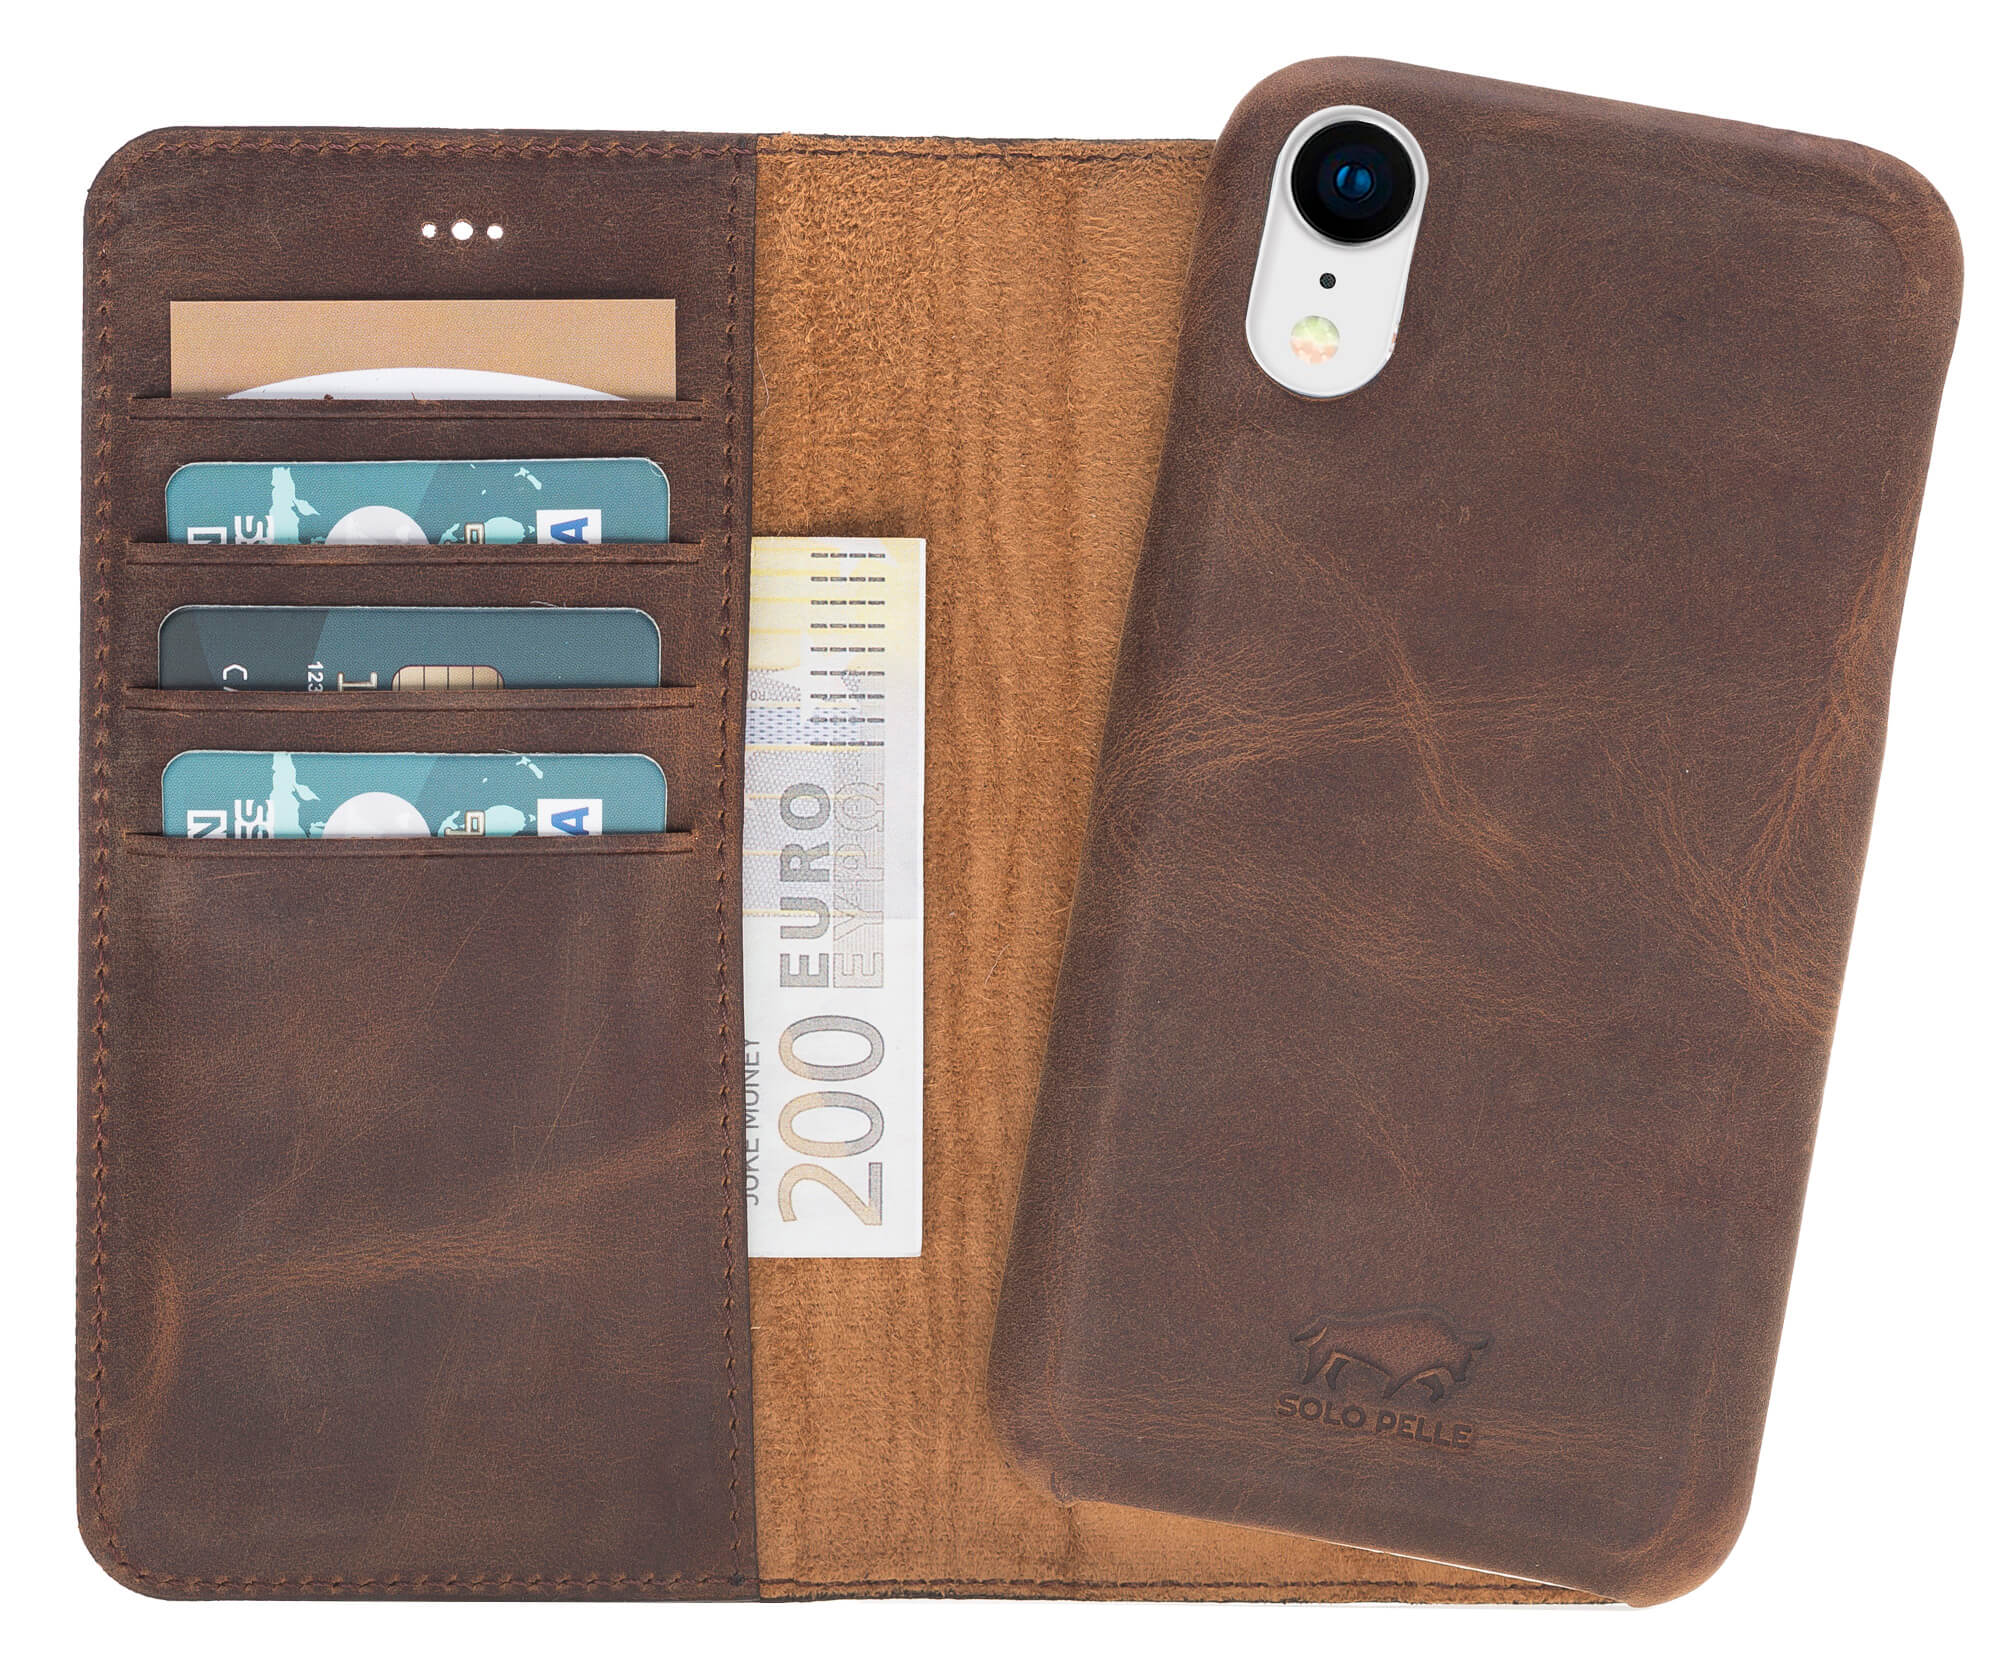 "iPhone XR 6.1 Zoll Abnehmbare Lederhülle ""Clemson"" in Vintage Braun Leder Hülle Tasche Lederhülle Ledertasche"